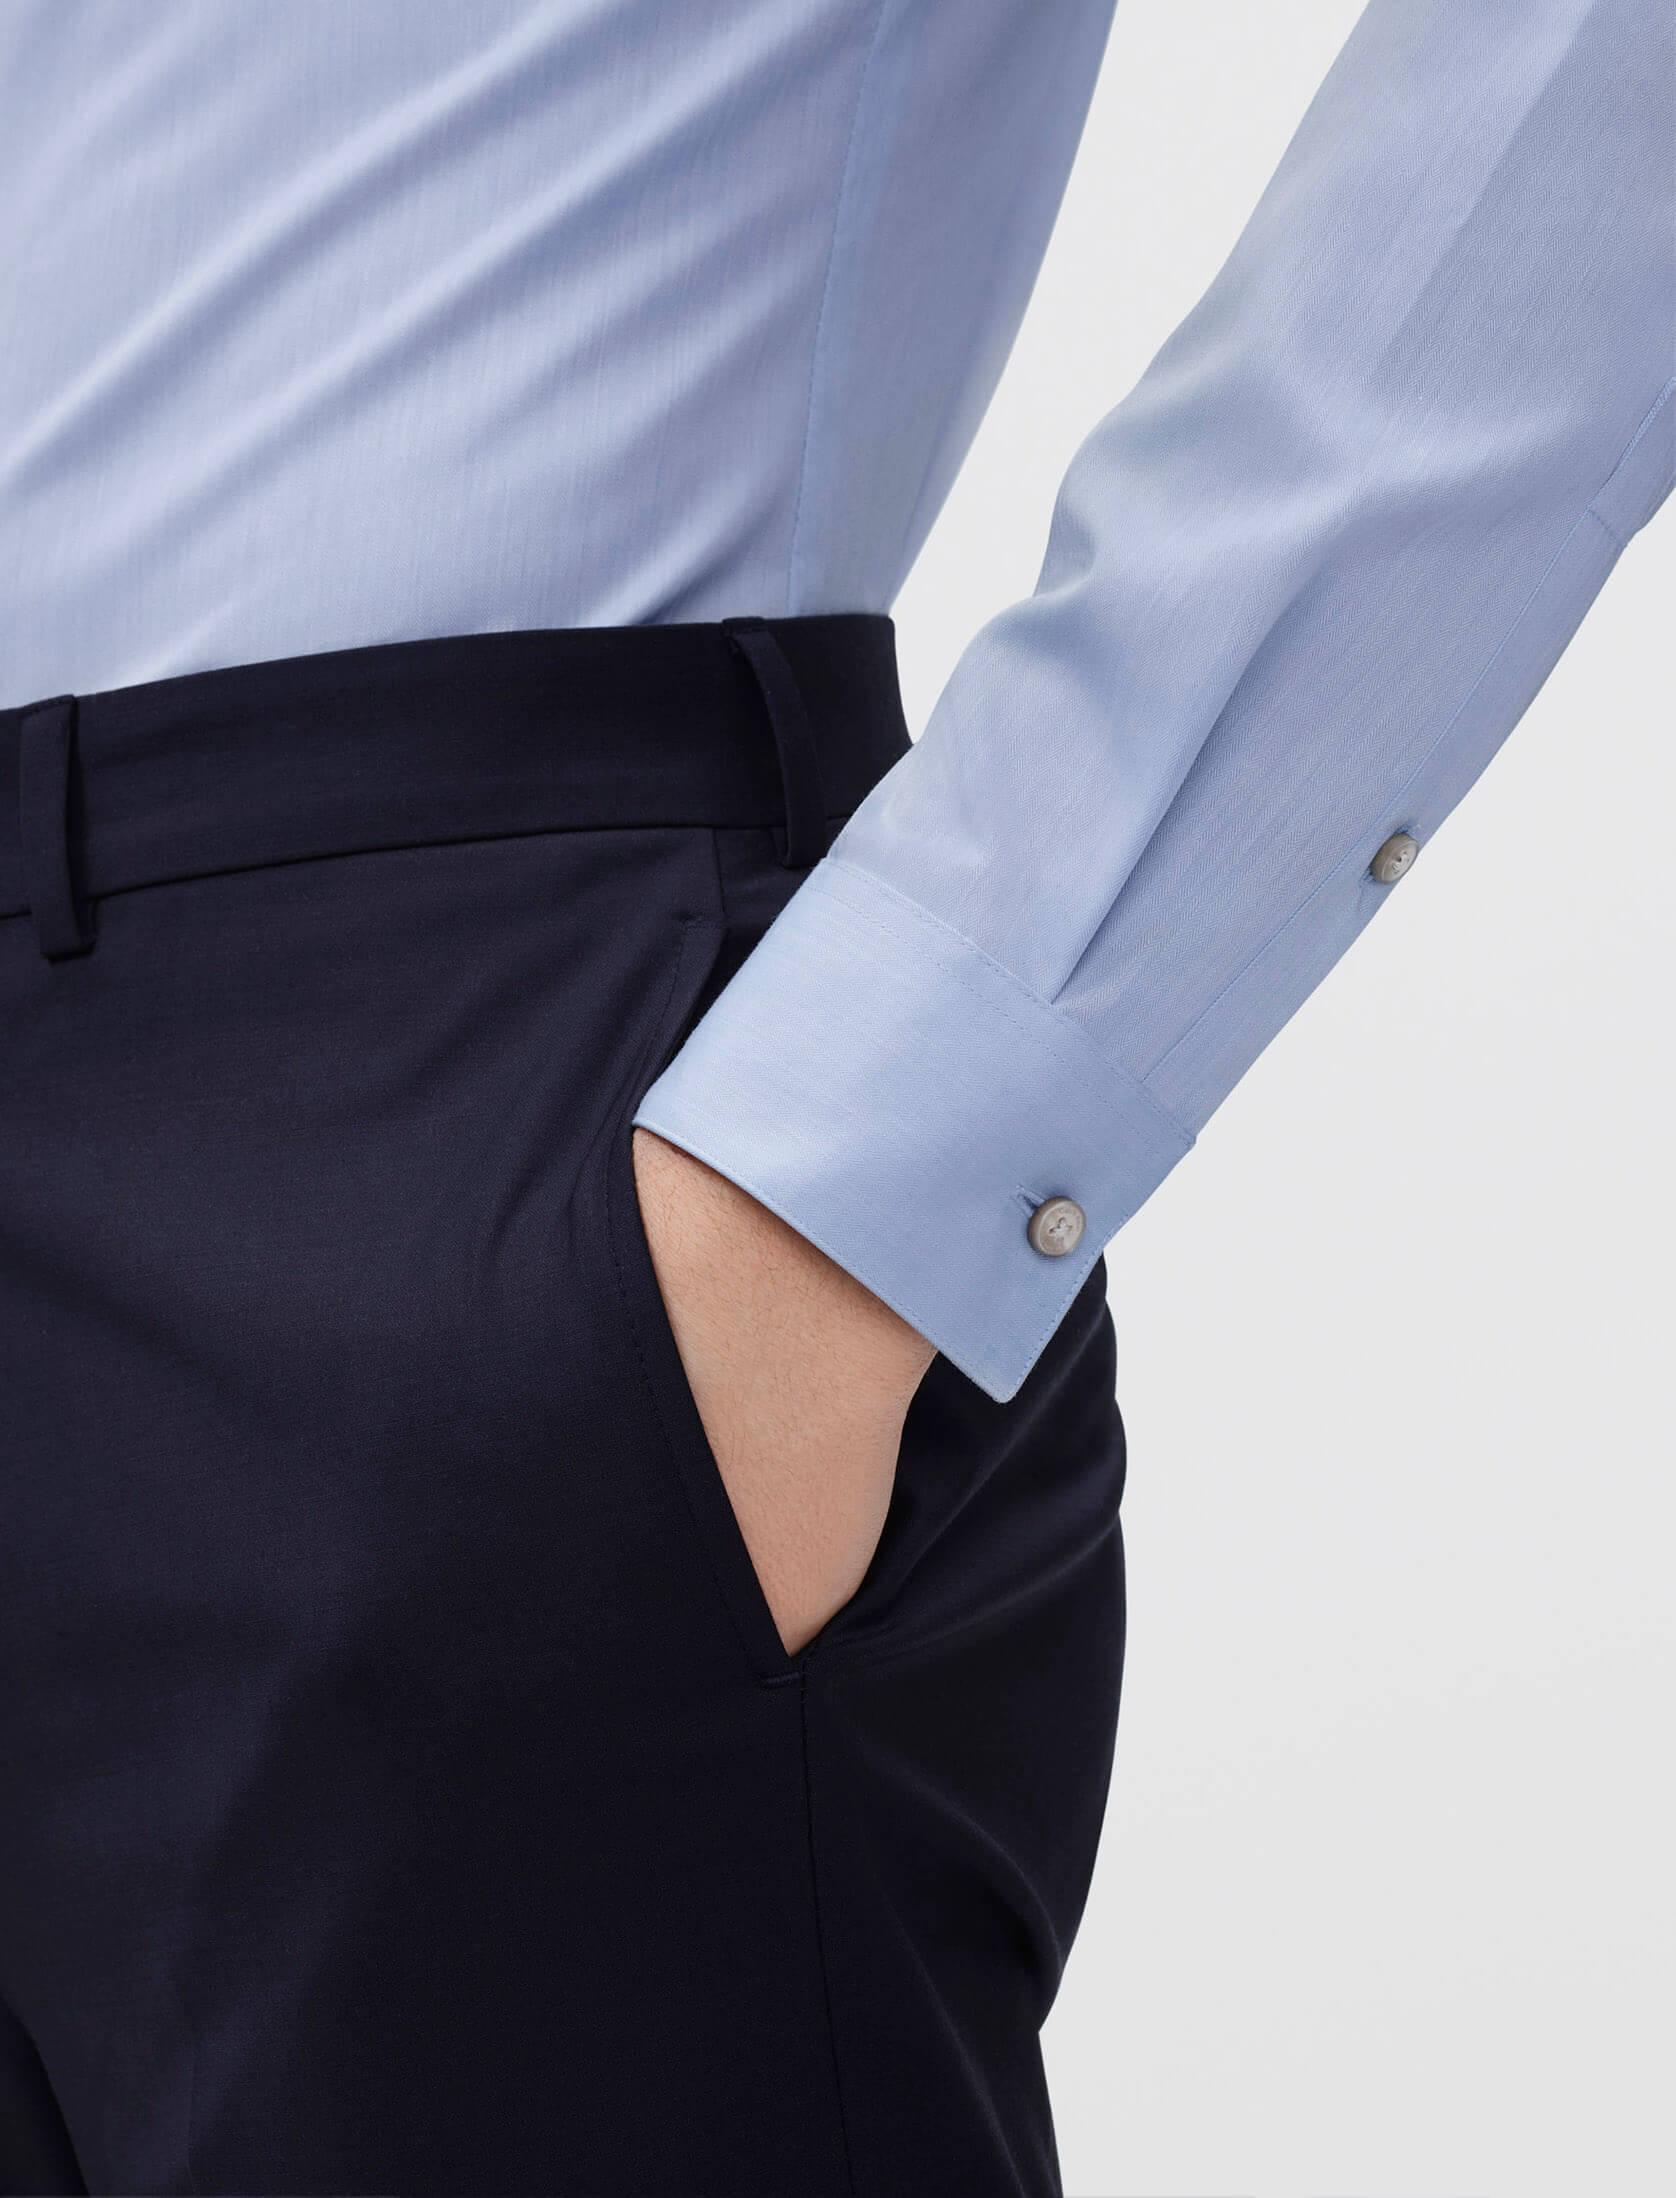 53dda57b6f4fe4 Men's Dress Shirts | Fitted and Casual Dress Shirts